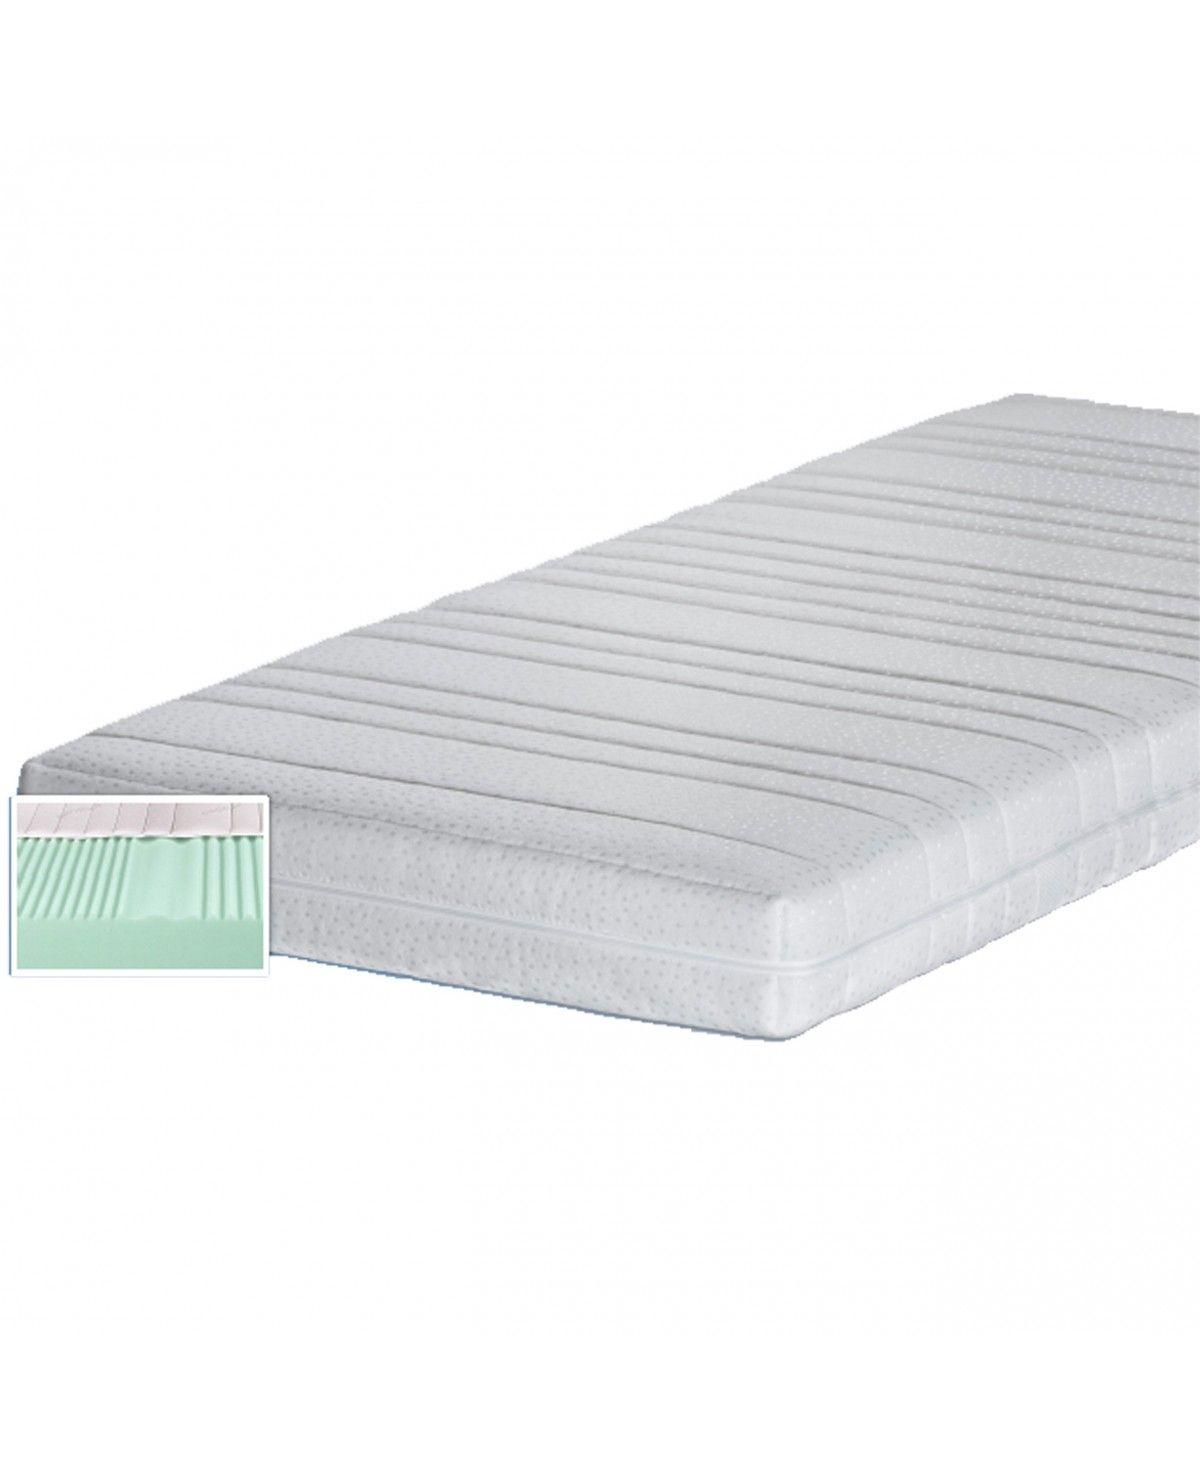 winkle cosmos kaltschaum 7 zonen matratze h2 140x200. Black Bedroom Furniture Sets. Home Design Ideas